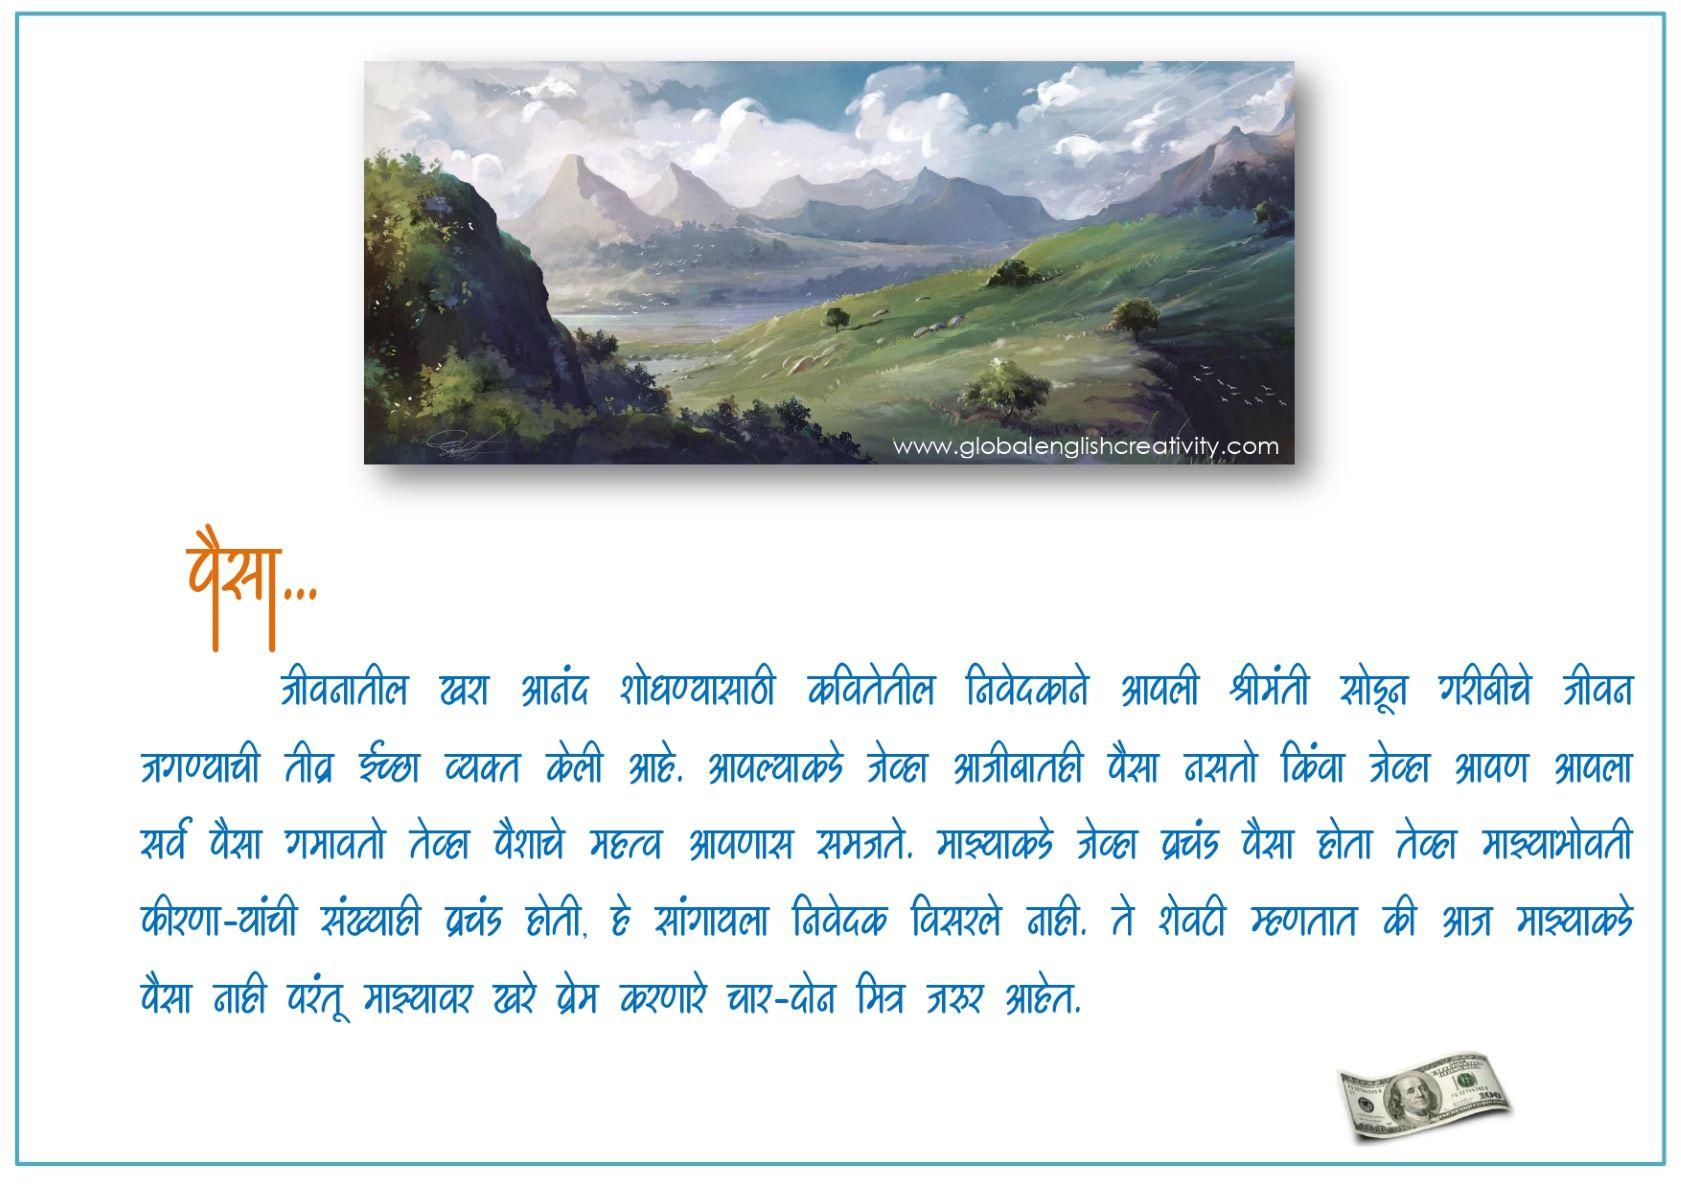 Std.12_Poem_2.6_MONEY_0006